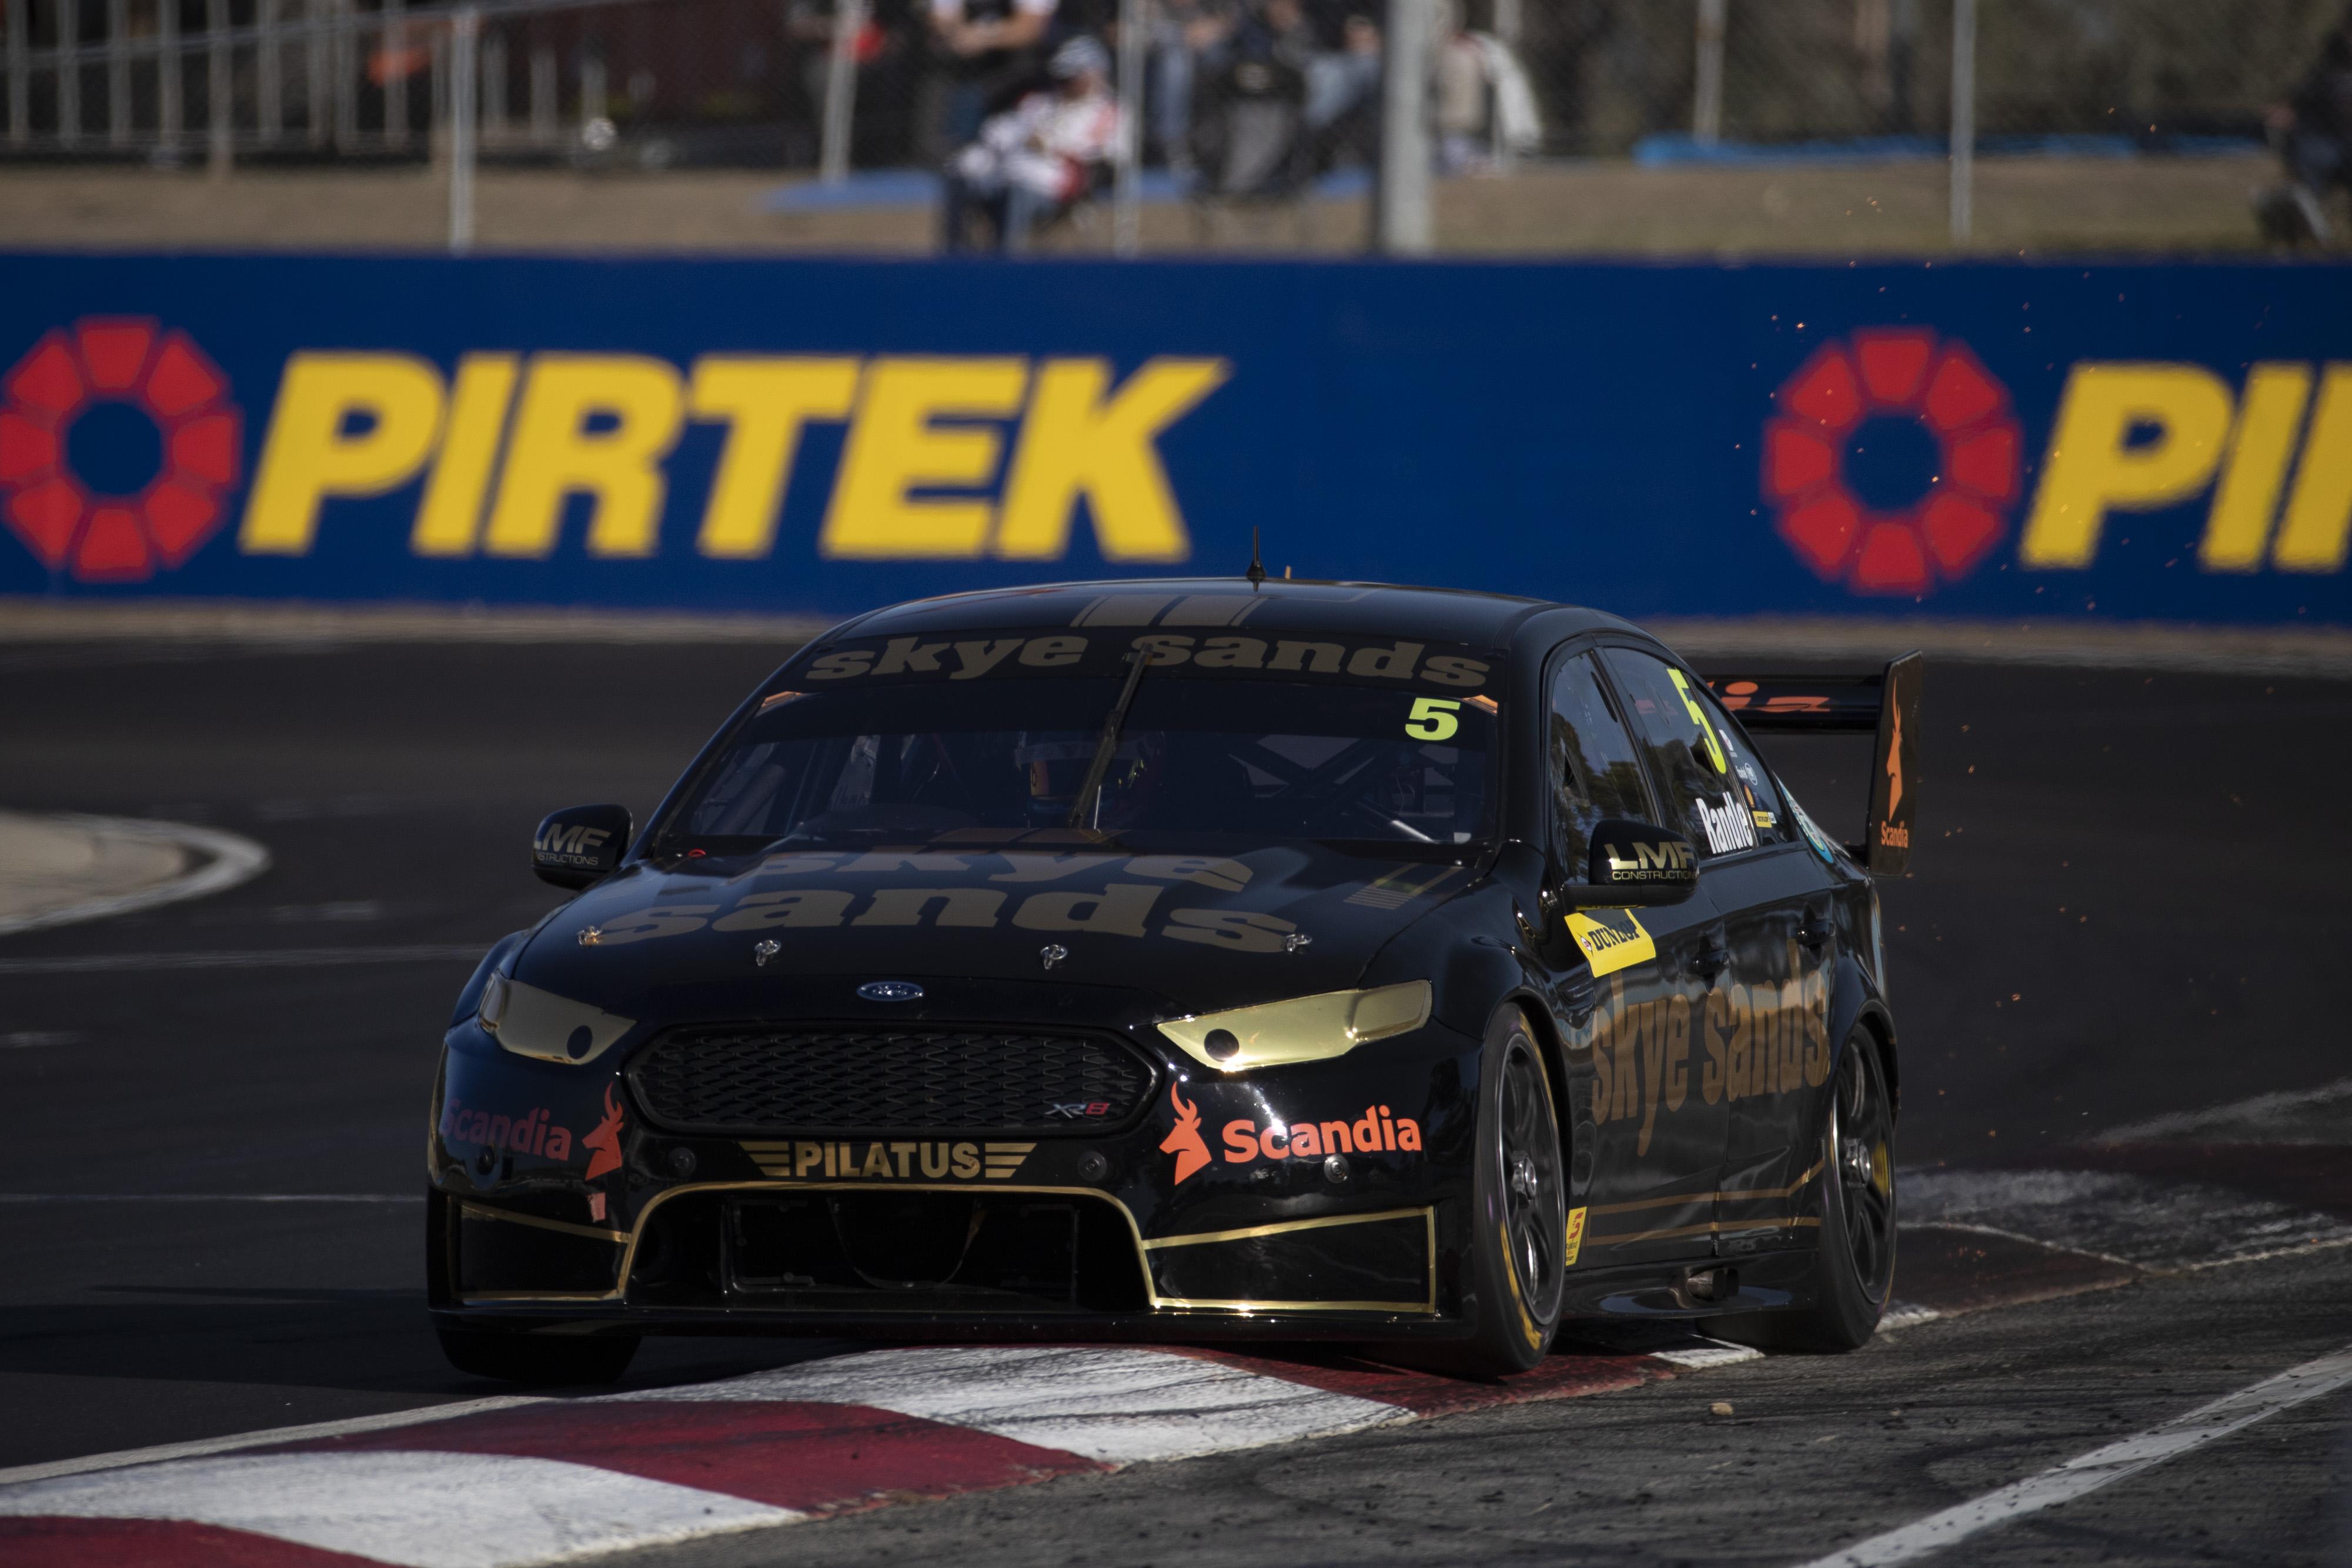 Dunlop Super 2 - 2019 - Barbagallo